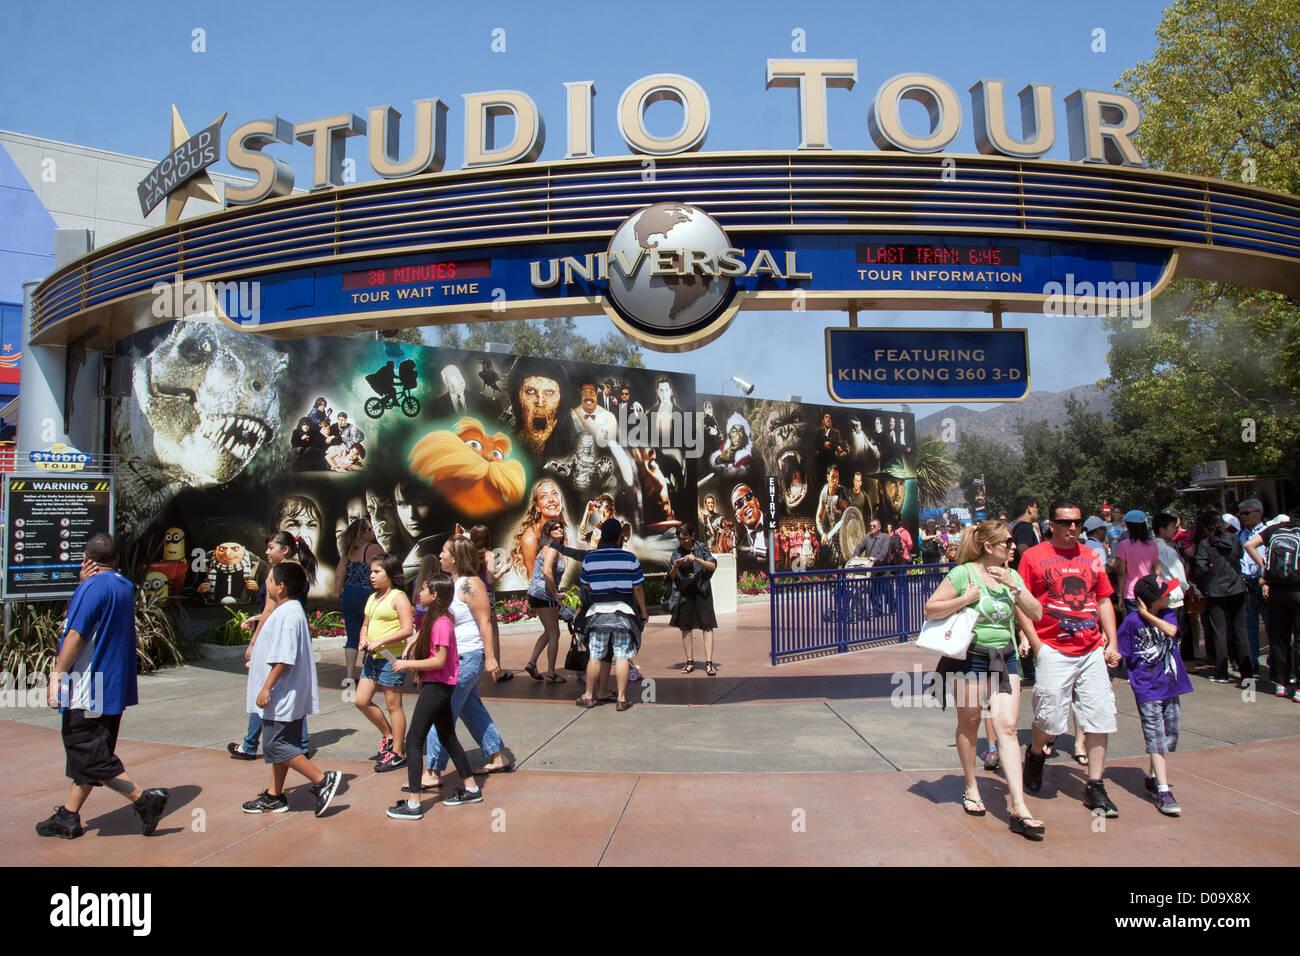 ENTRANCE TO THE STUDIO TOUR OF UNIVERSAL STUDIOS LOS ...